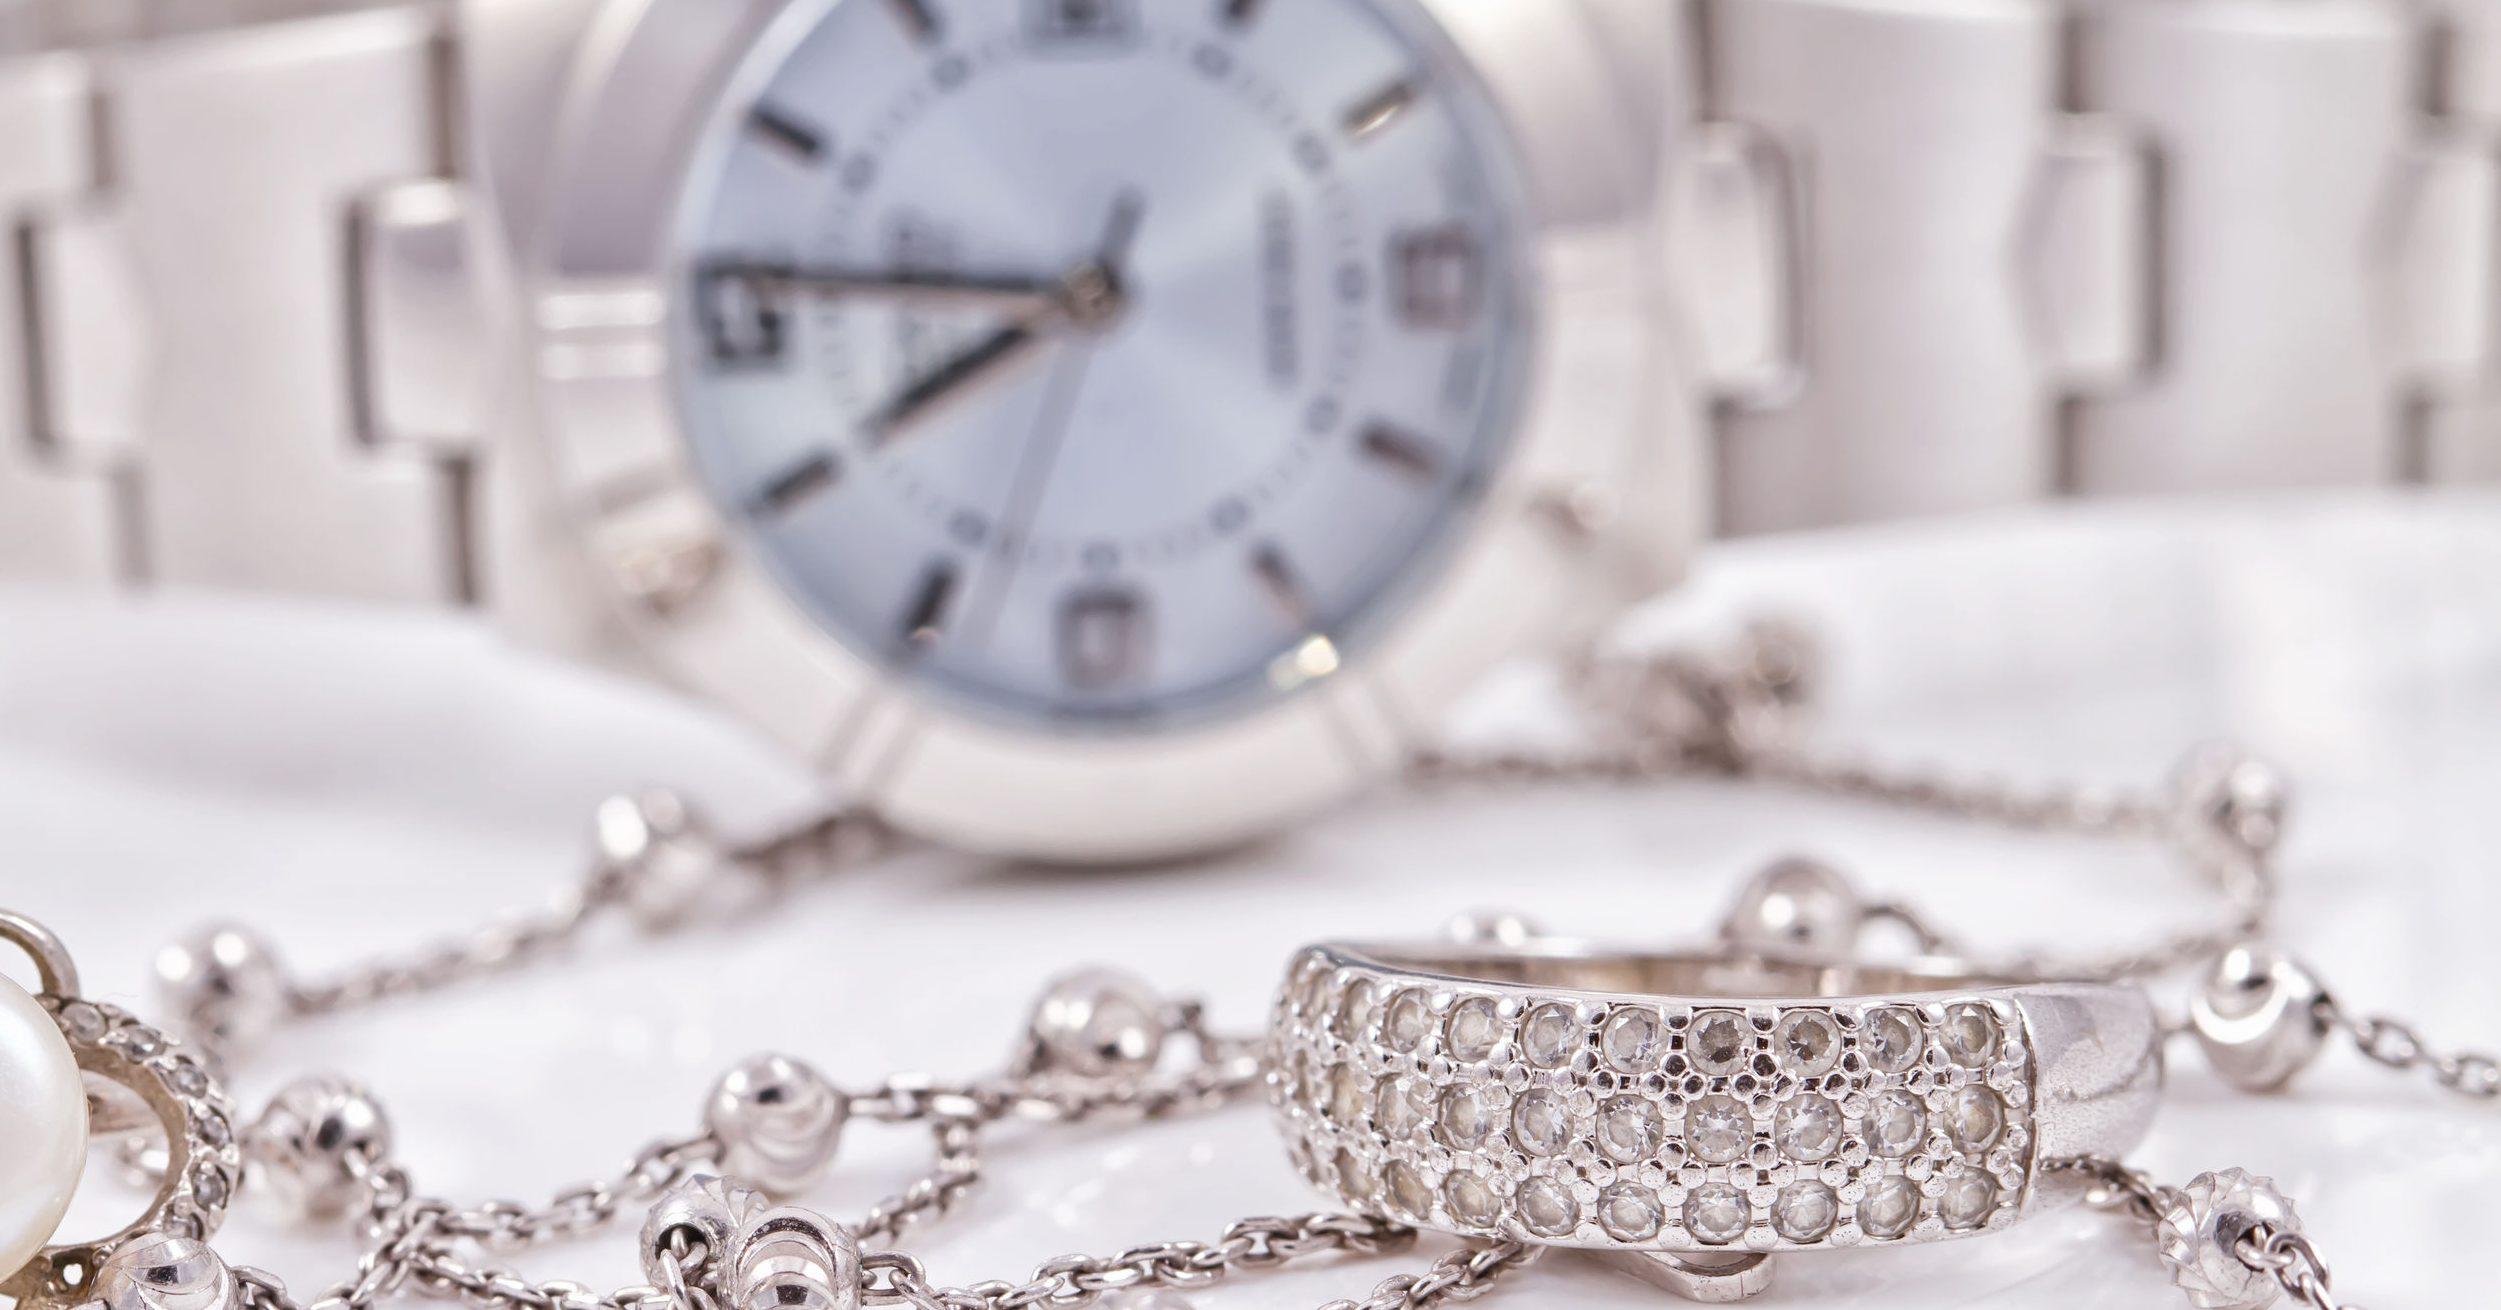 Timing: a Precious Fin Tube Element